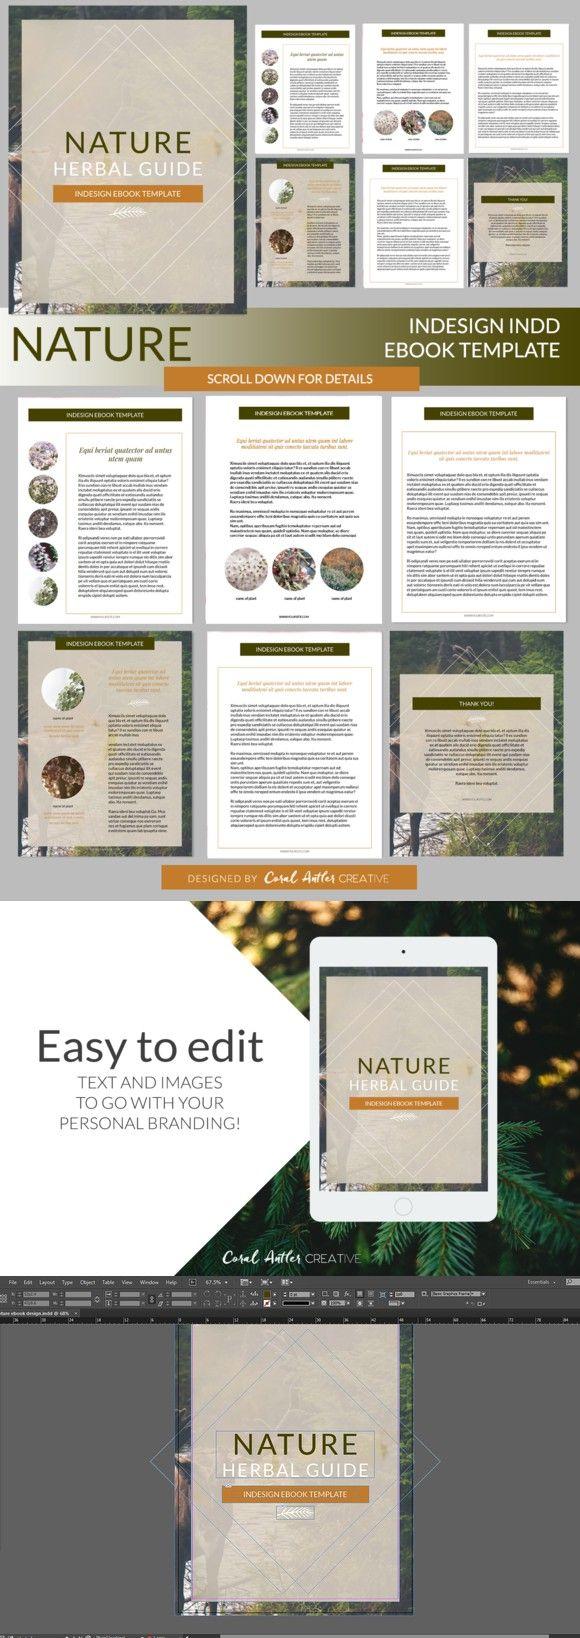 Nature InDesign Ebook Template | Presentation Templates | Pinterest ...